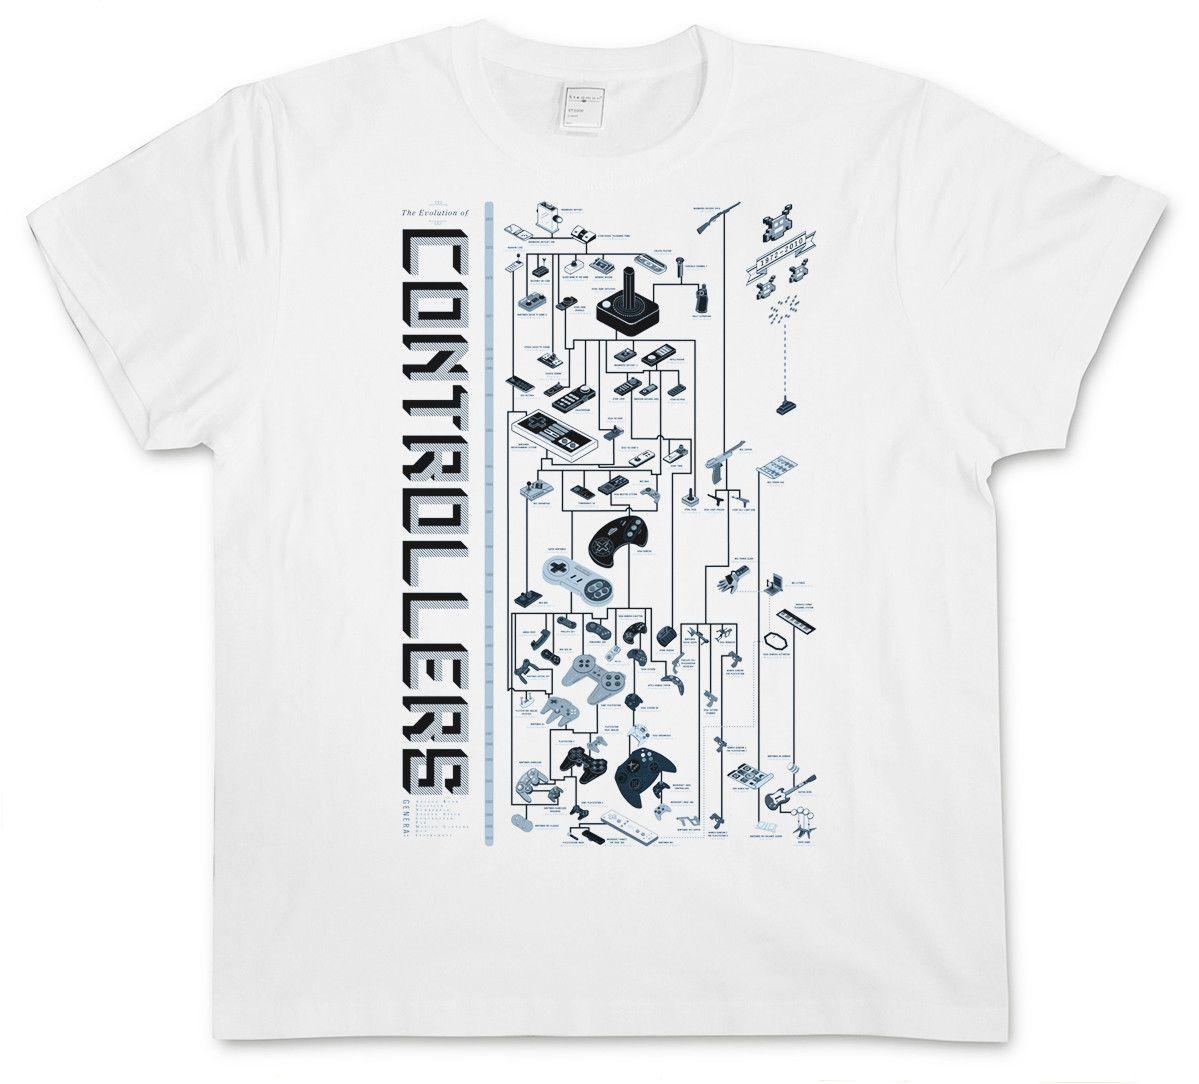 Controller Evolution T-Shirt Videospiel Konsole Nes Joystick Gamepad Pc Nerd